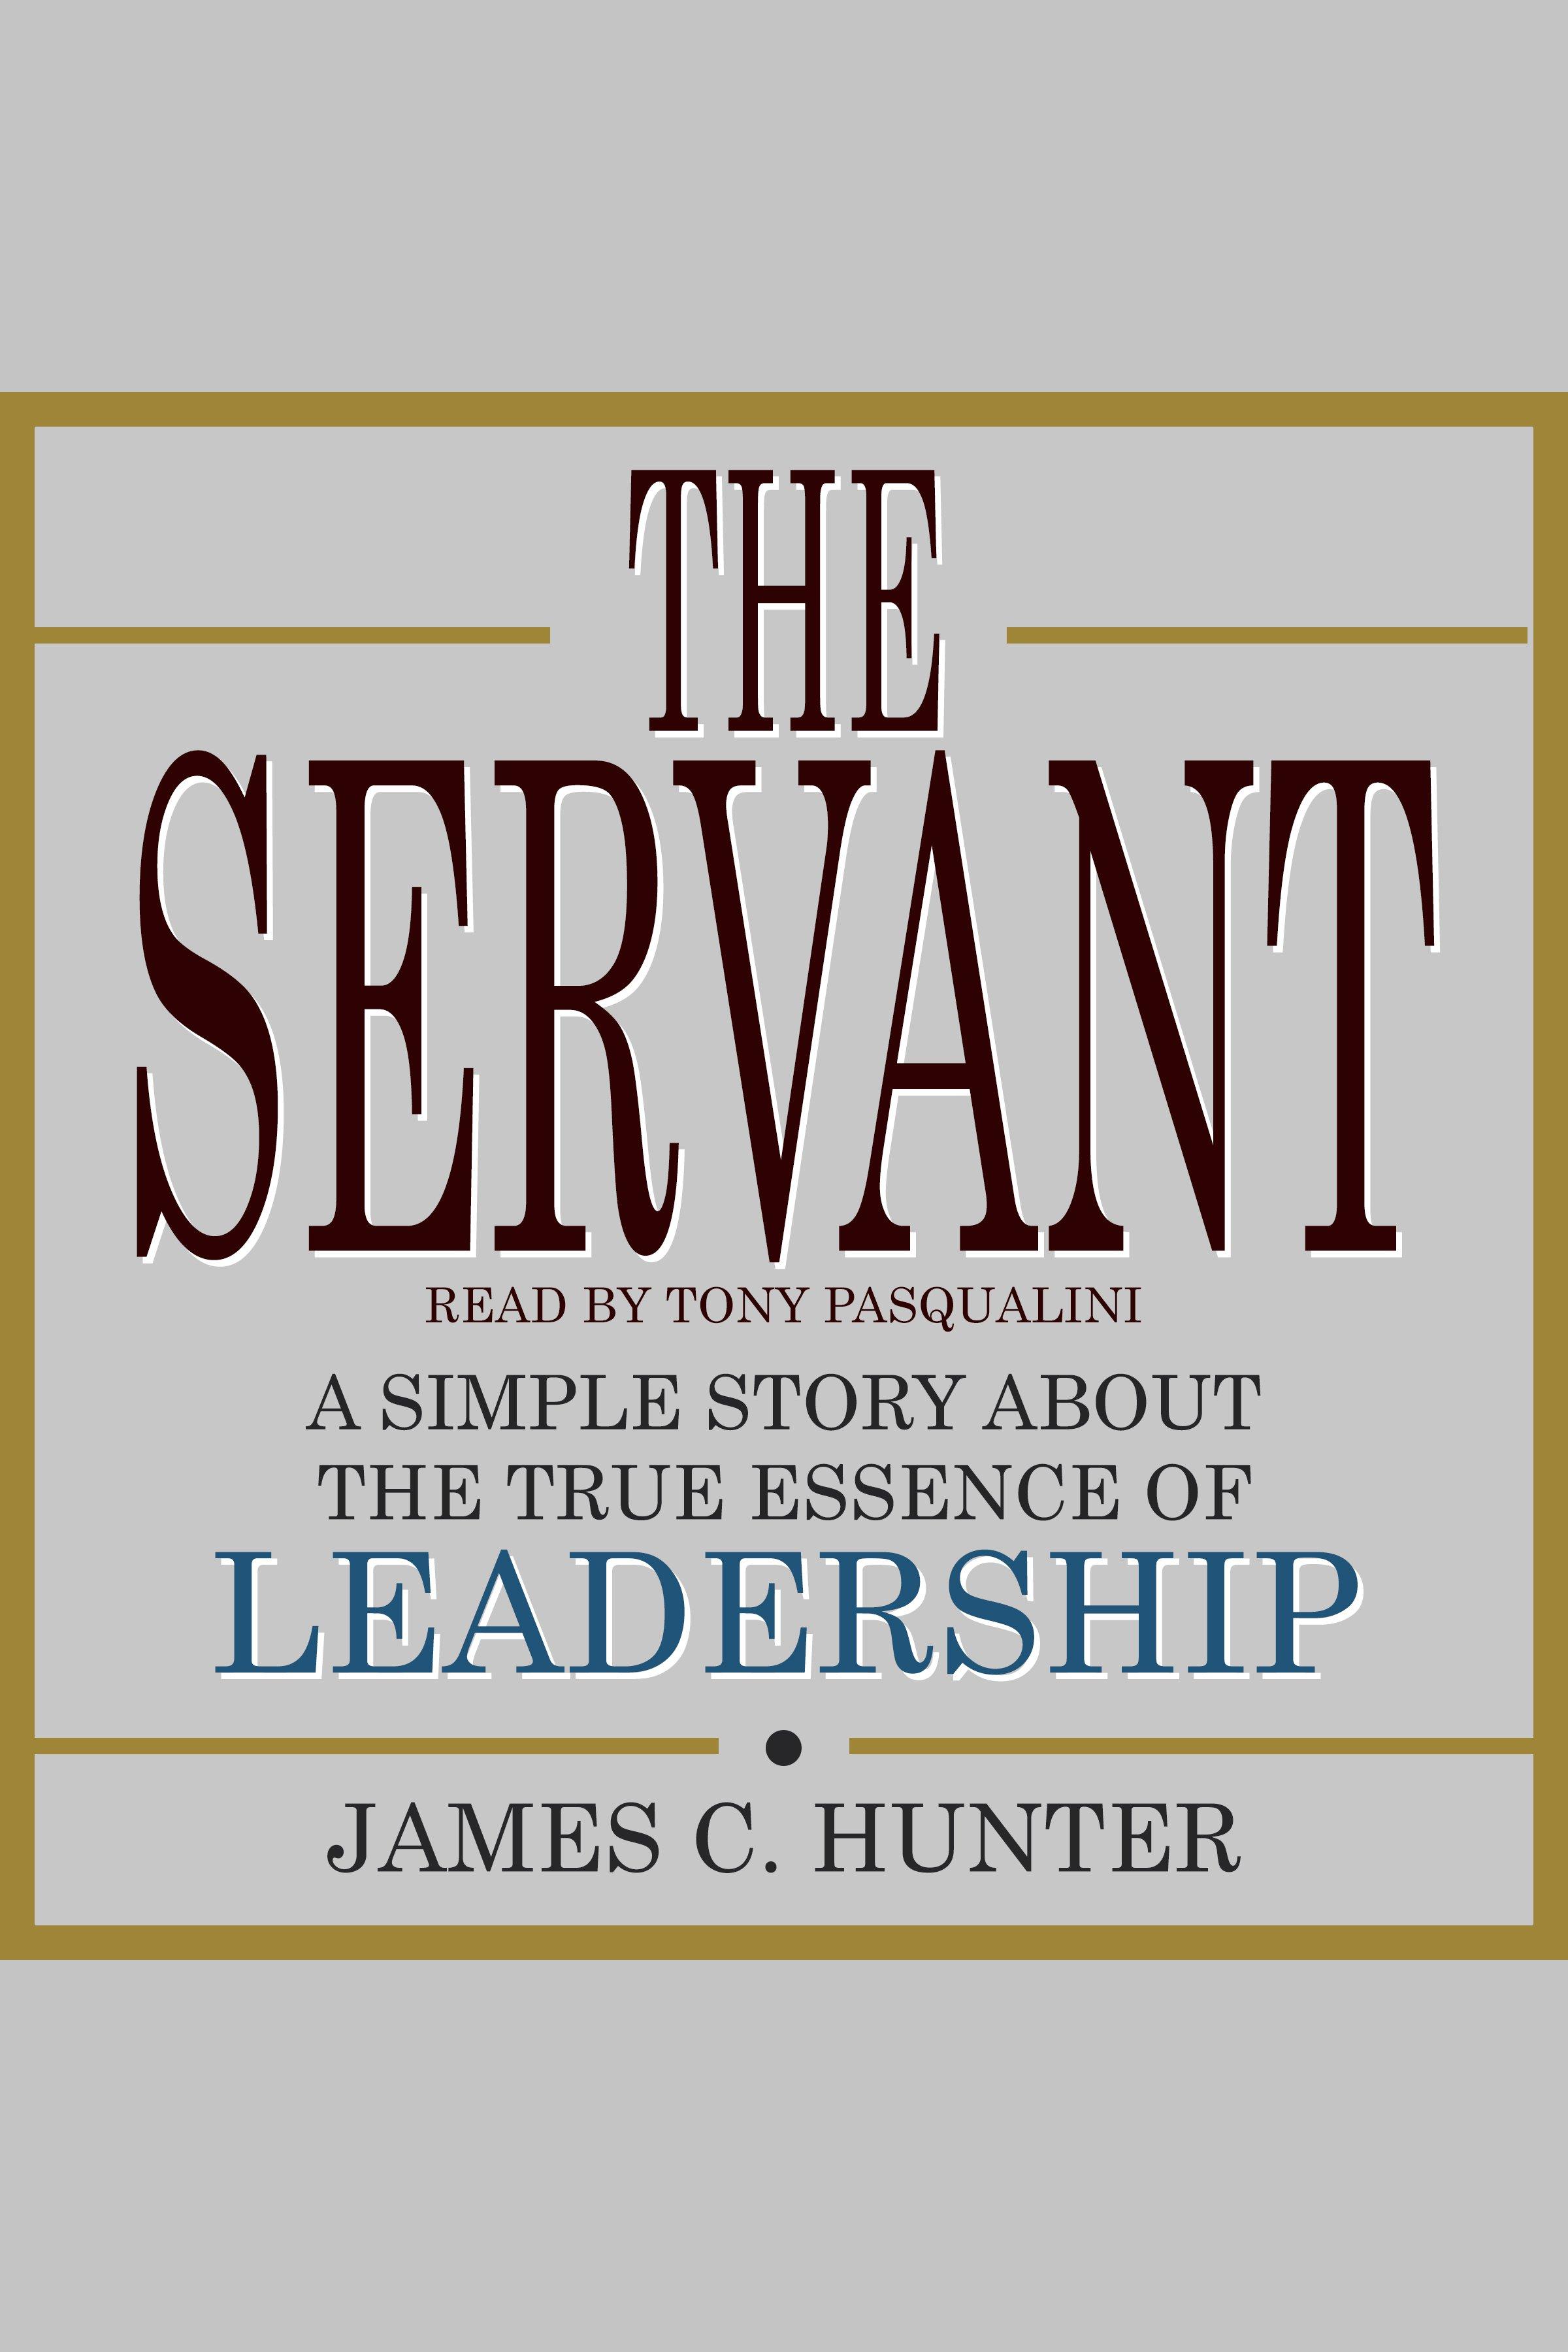 Esta es la portada del audiolibro Servant, The